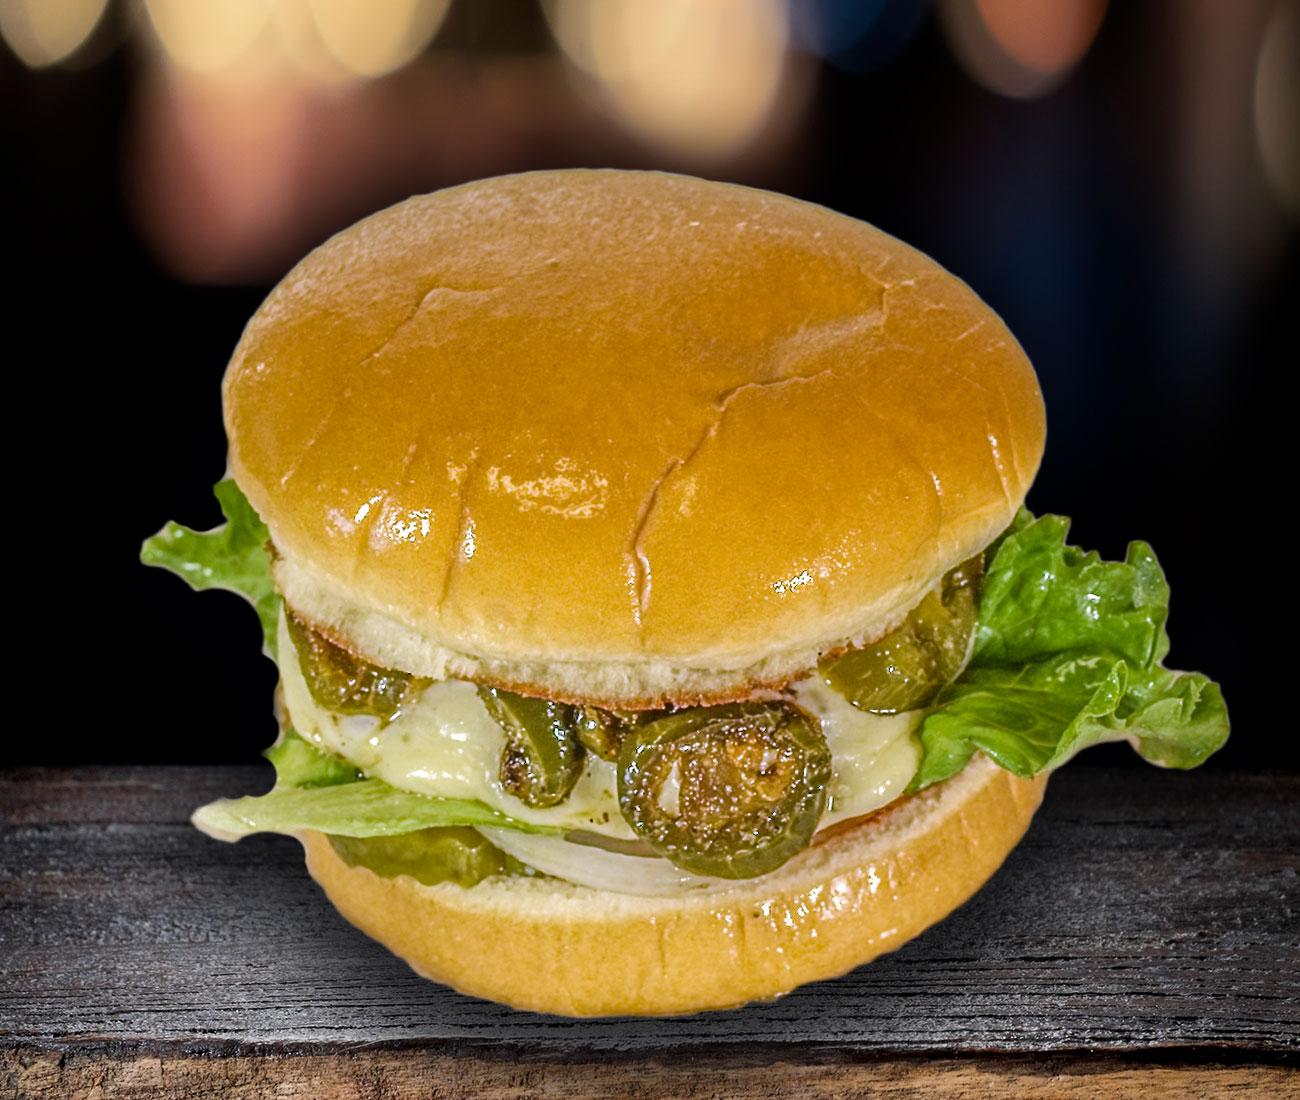 The Arson Burger